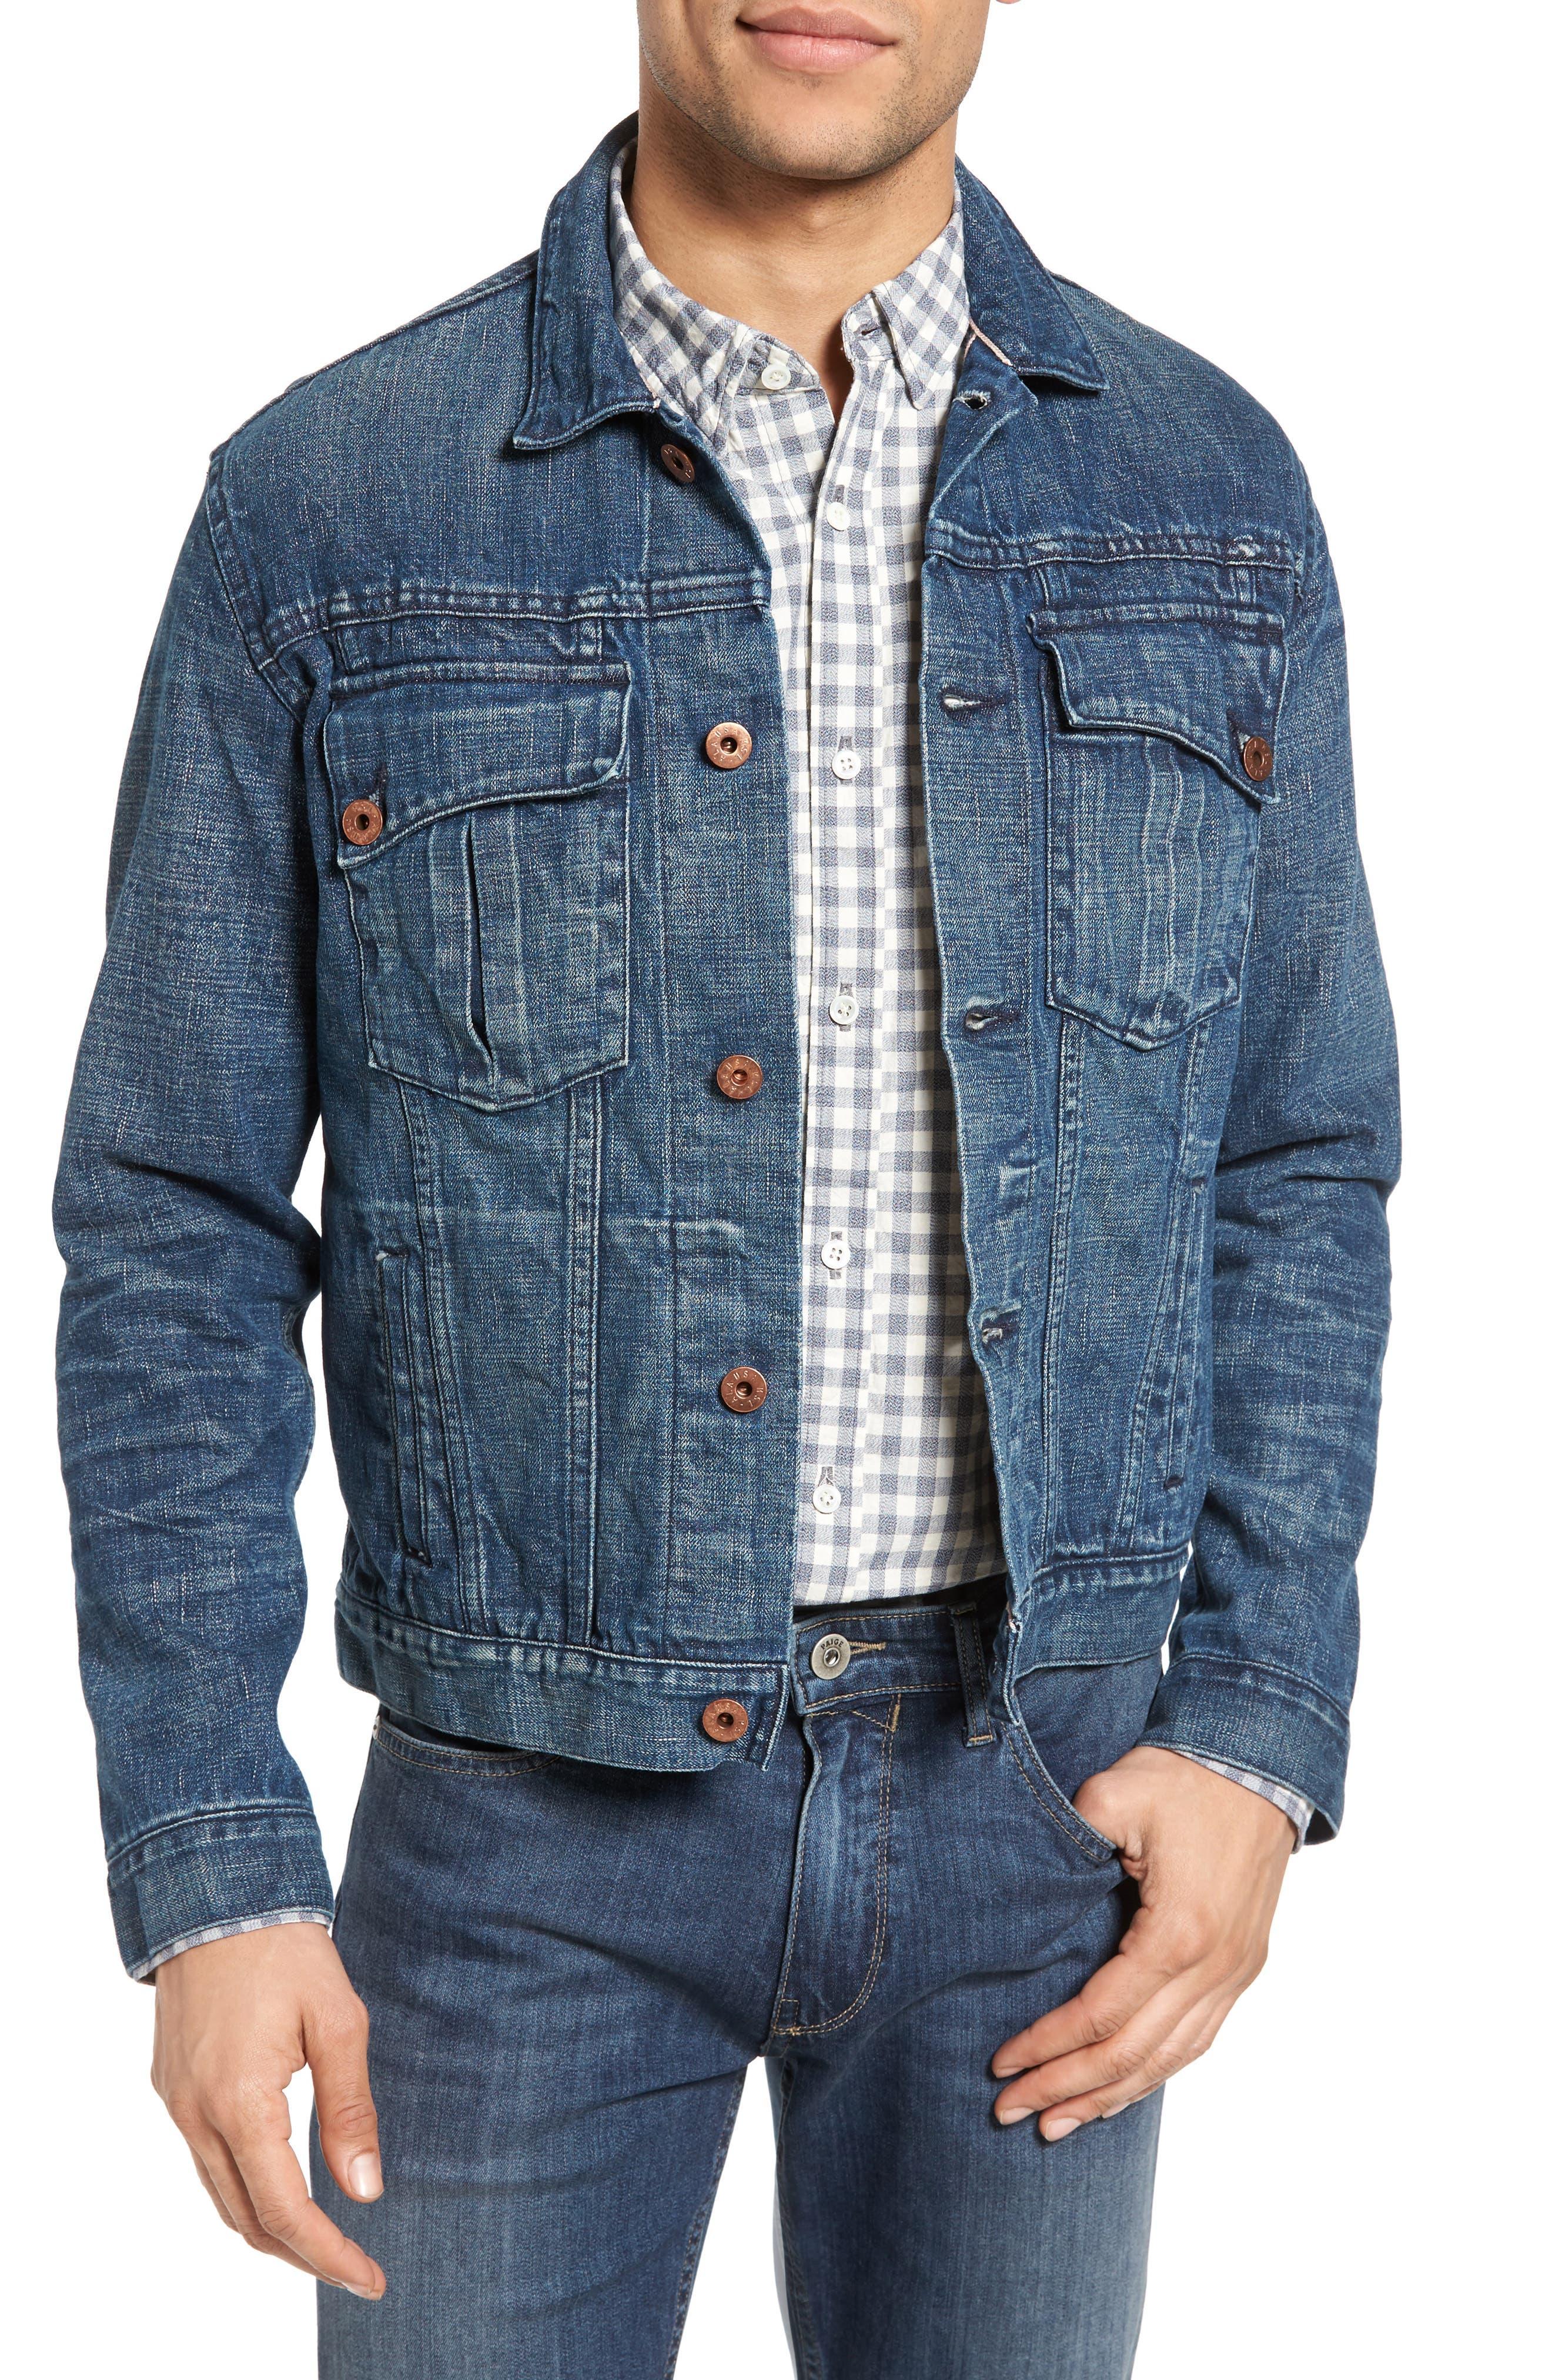 Clayton Distressed Selvedge Denim Jacket,                         Main,                         color, 413